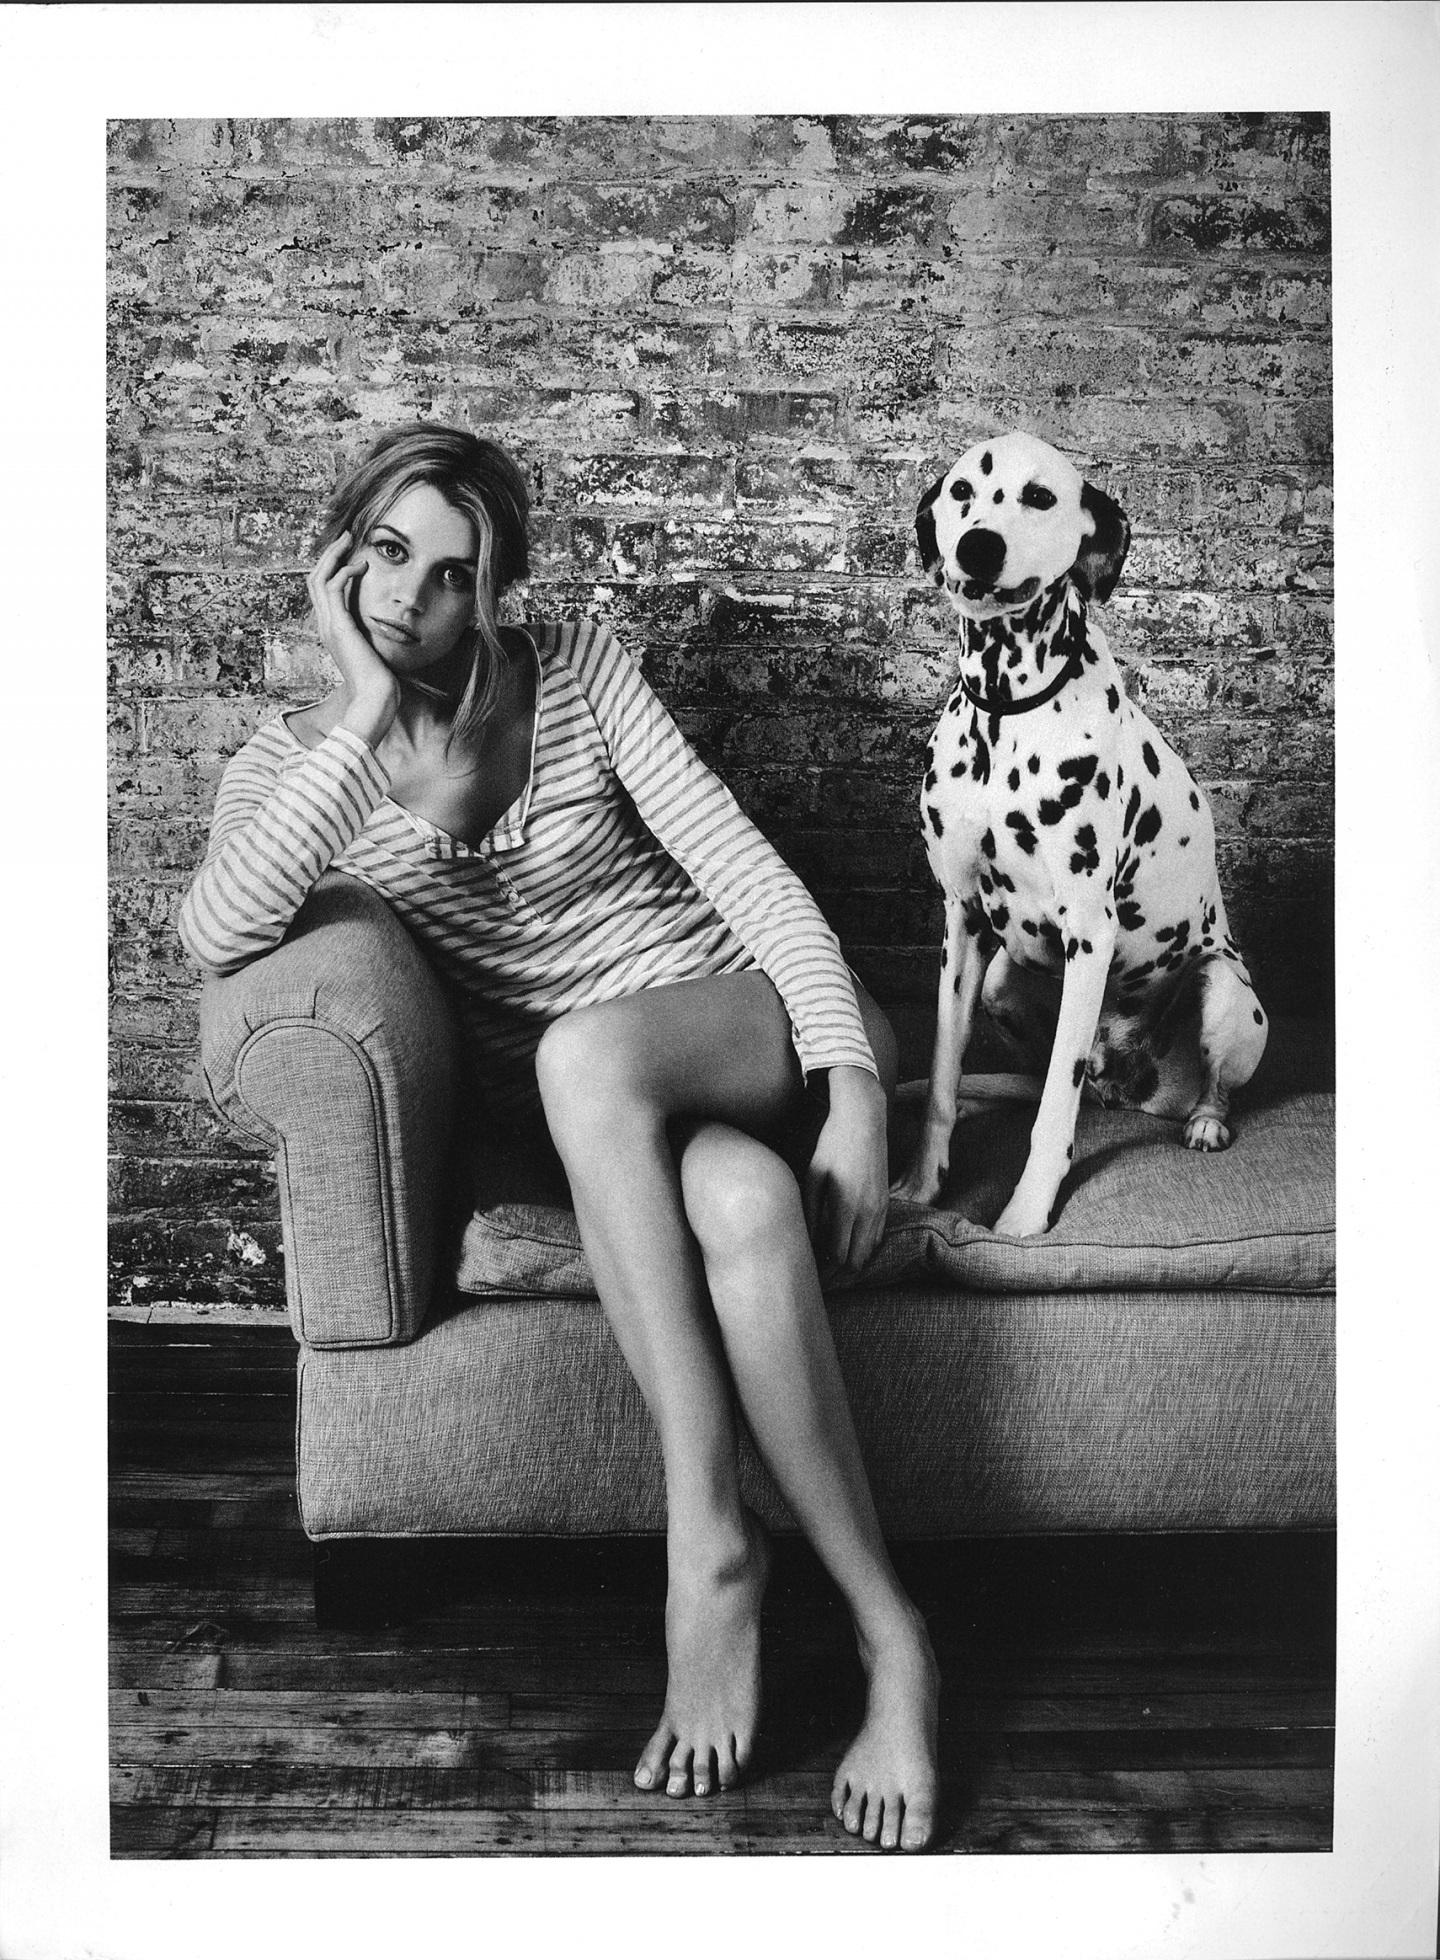 Jayne Moore for Australian Elle Marianne faithfull fashion story shot by Pamela Hanson  Sptty dog Dalmatian bedroom chic casual style